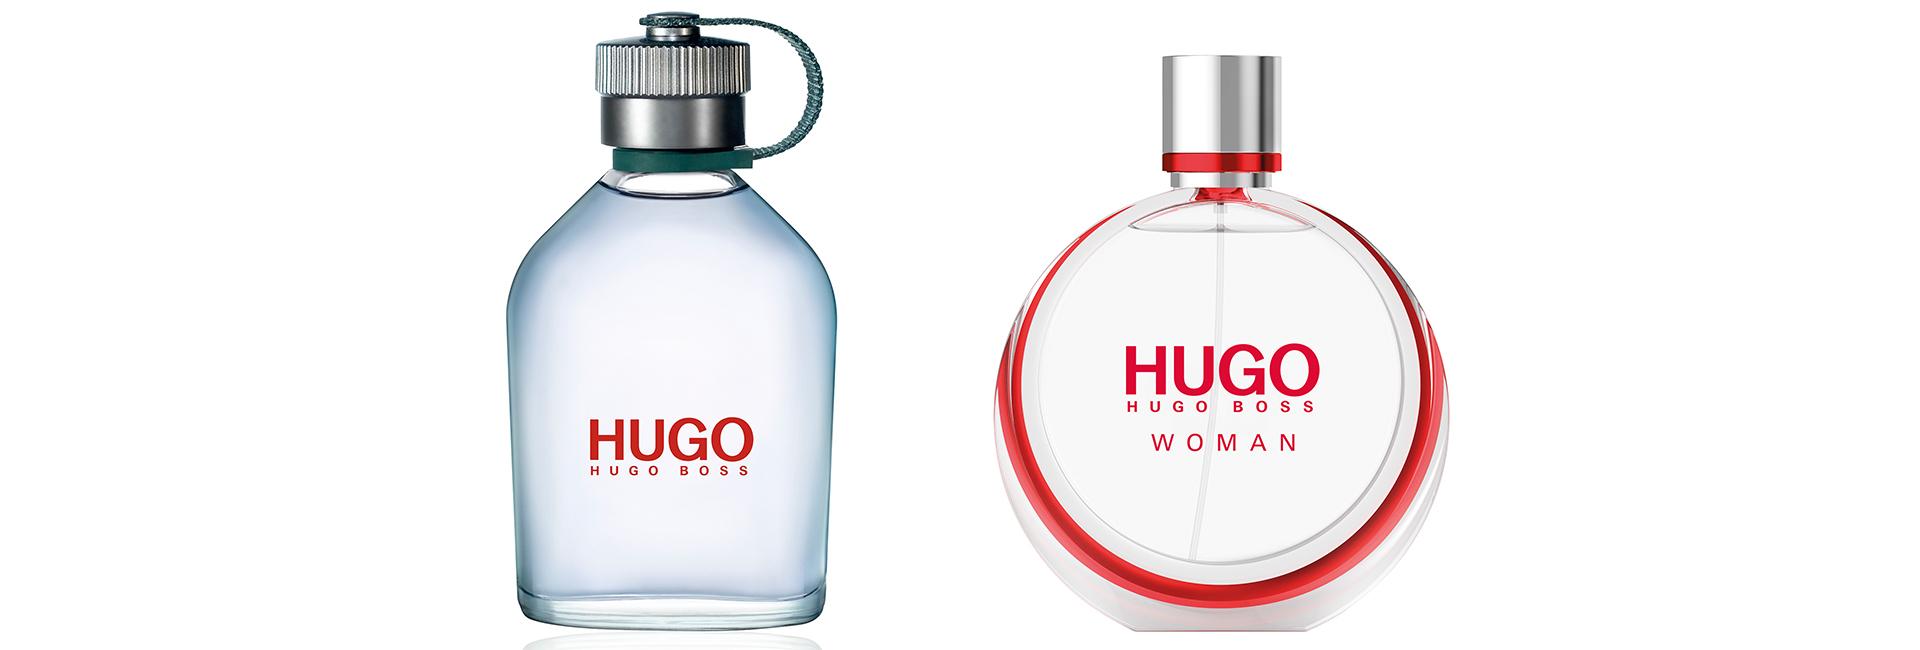 nouveau parfum hugo boss femme teduh hostel. Black Bedroom Furniture Sets. Home Design Ideas